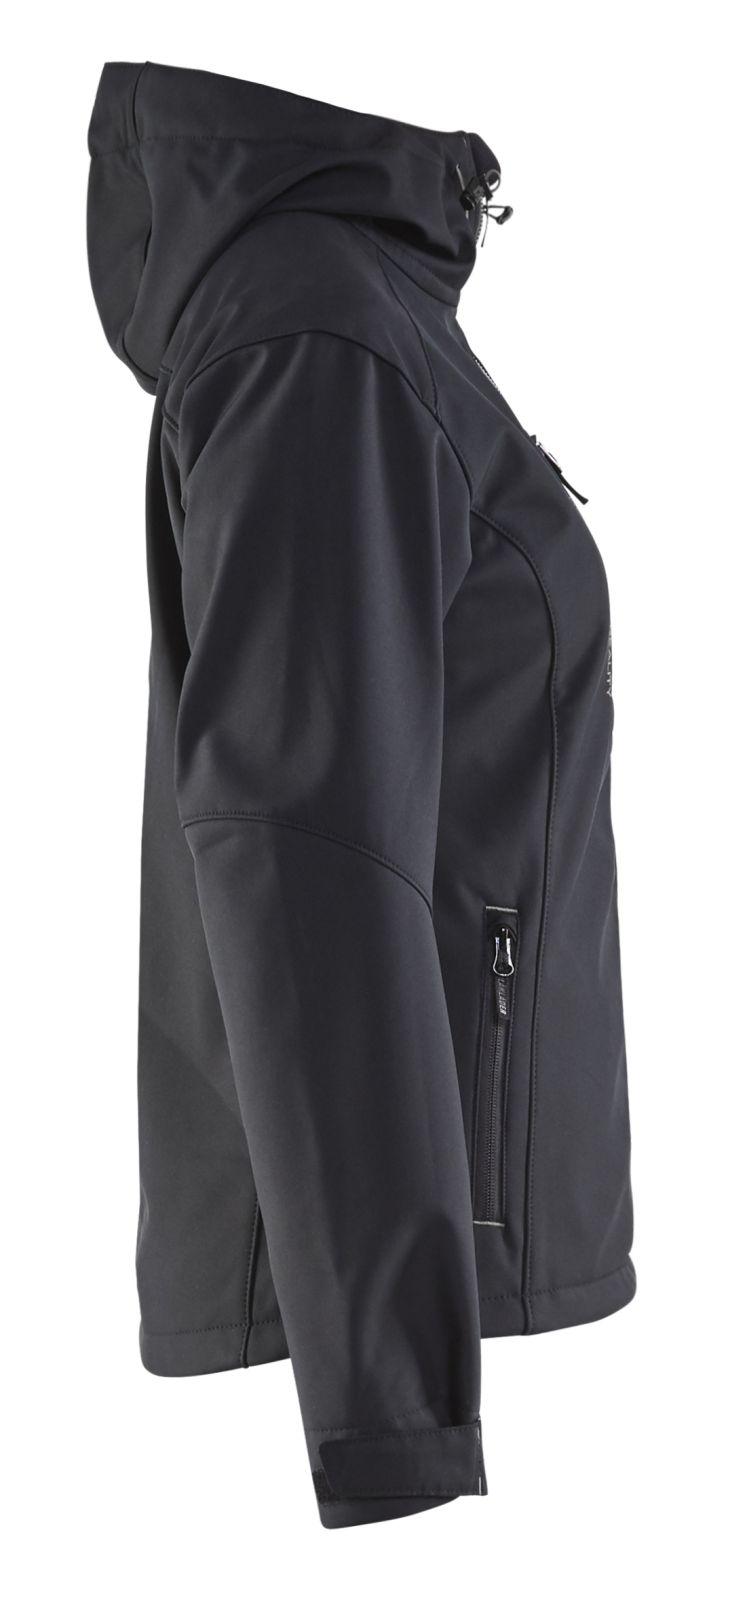 Blaklader Dames softshell jacks 49192517 zwart-zilver(9992)